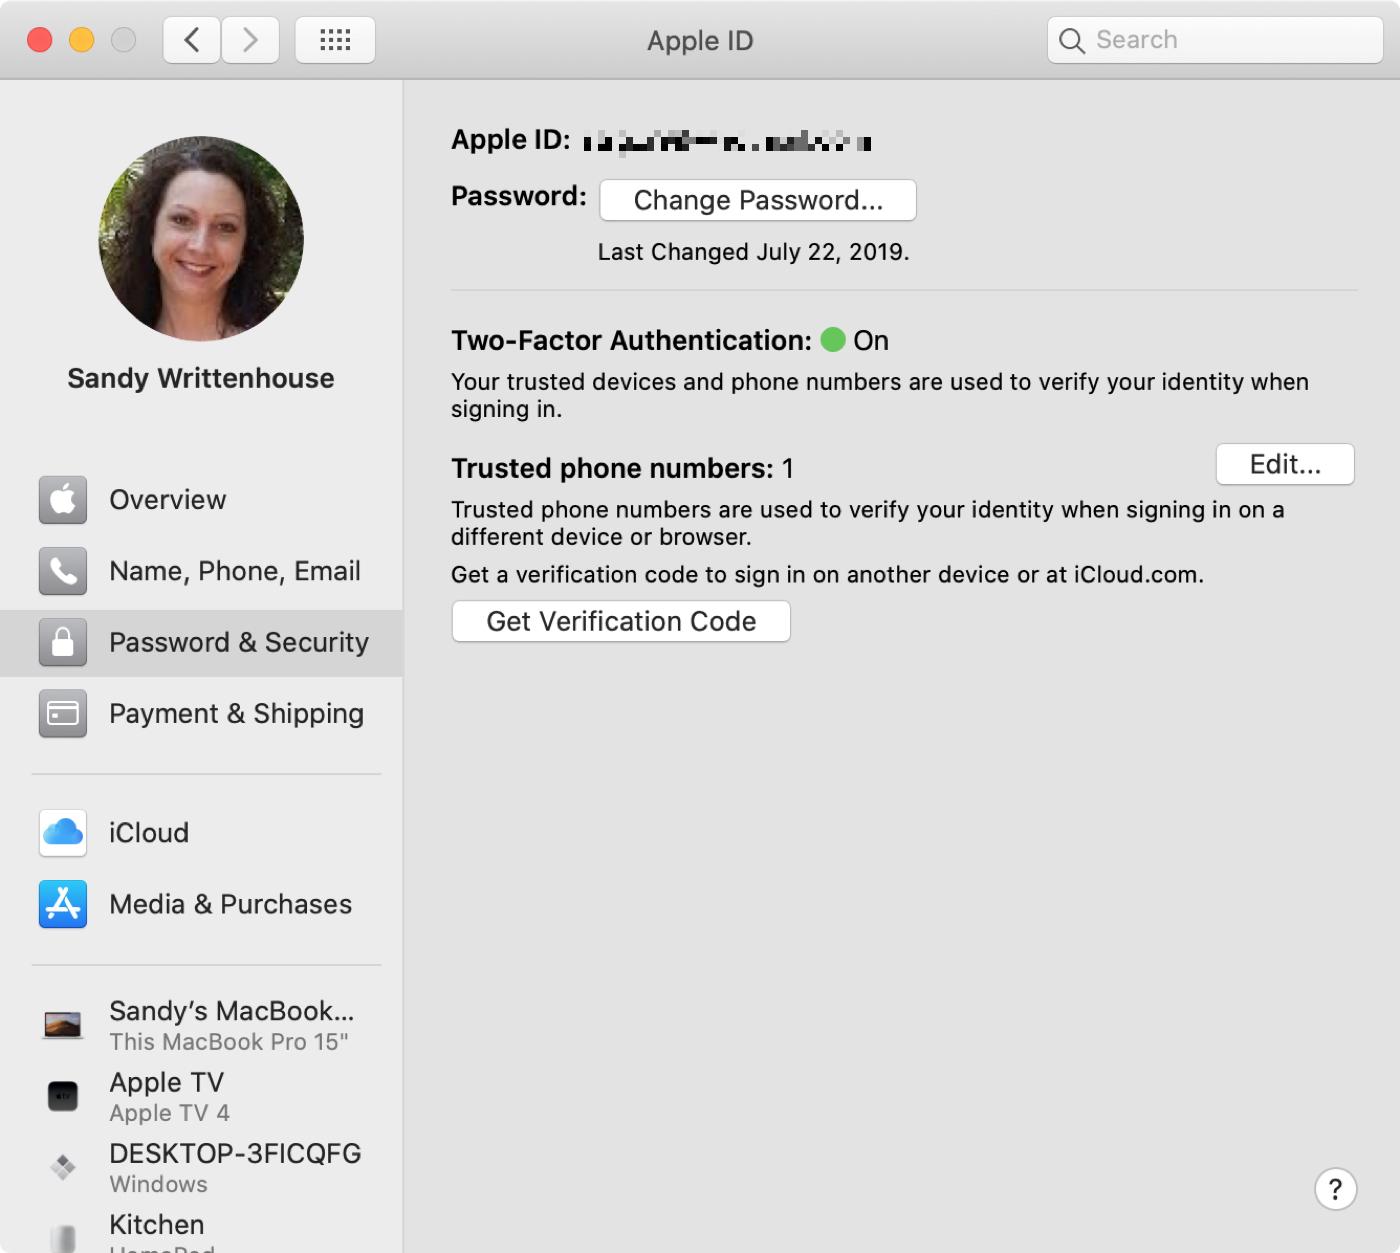 Apple ID Password Security